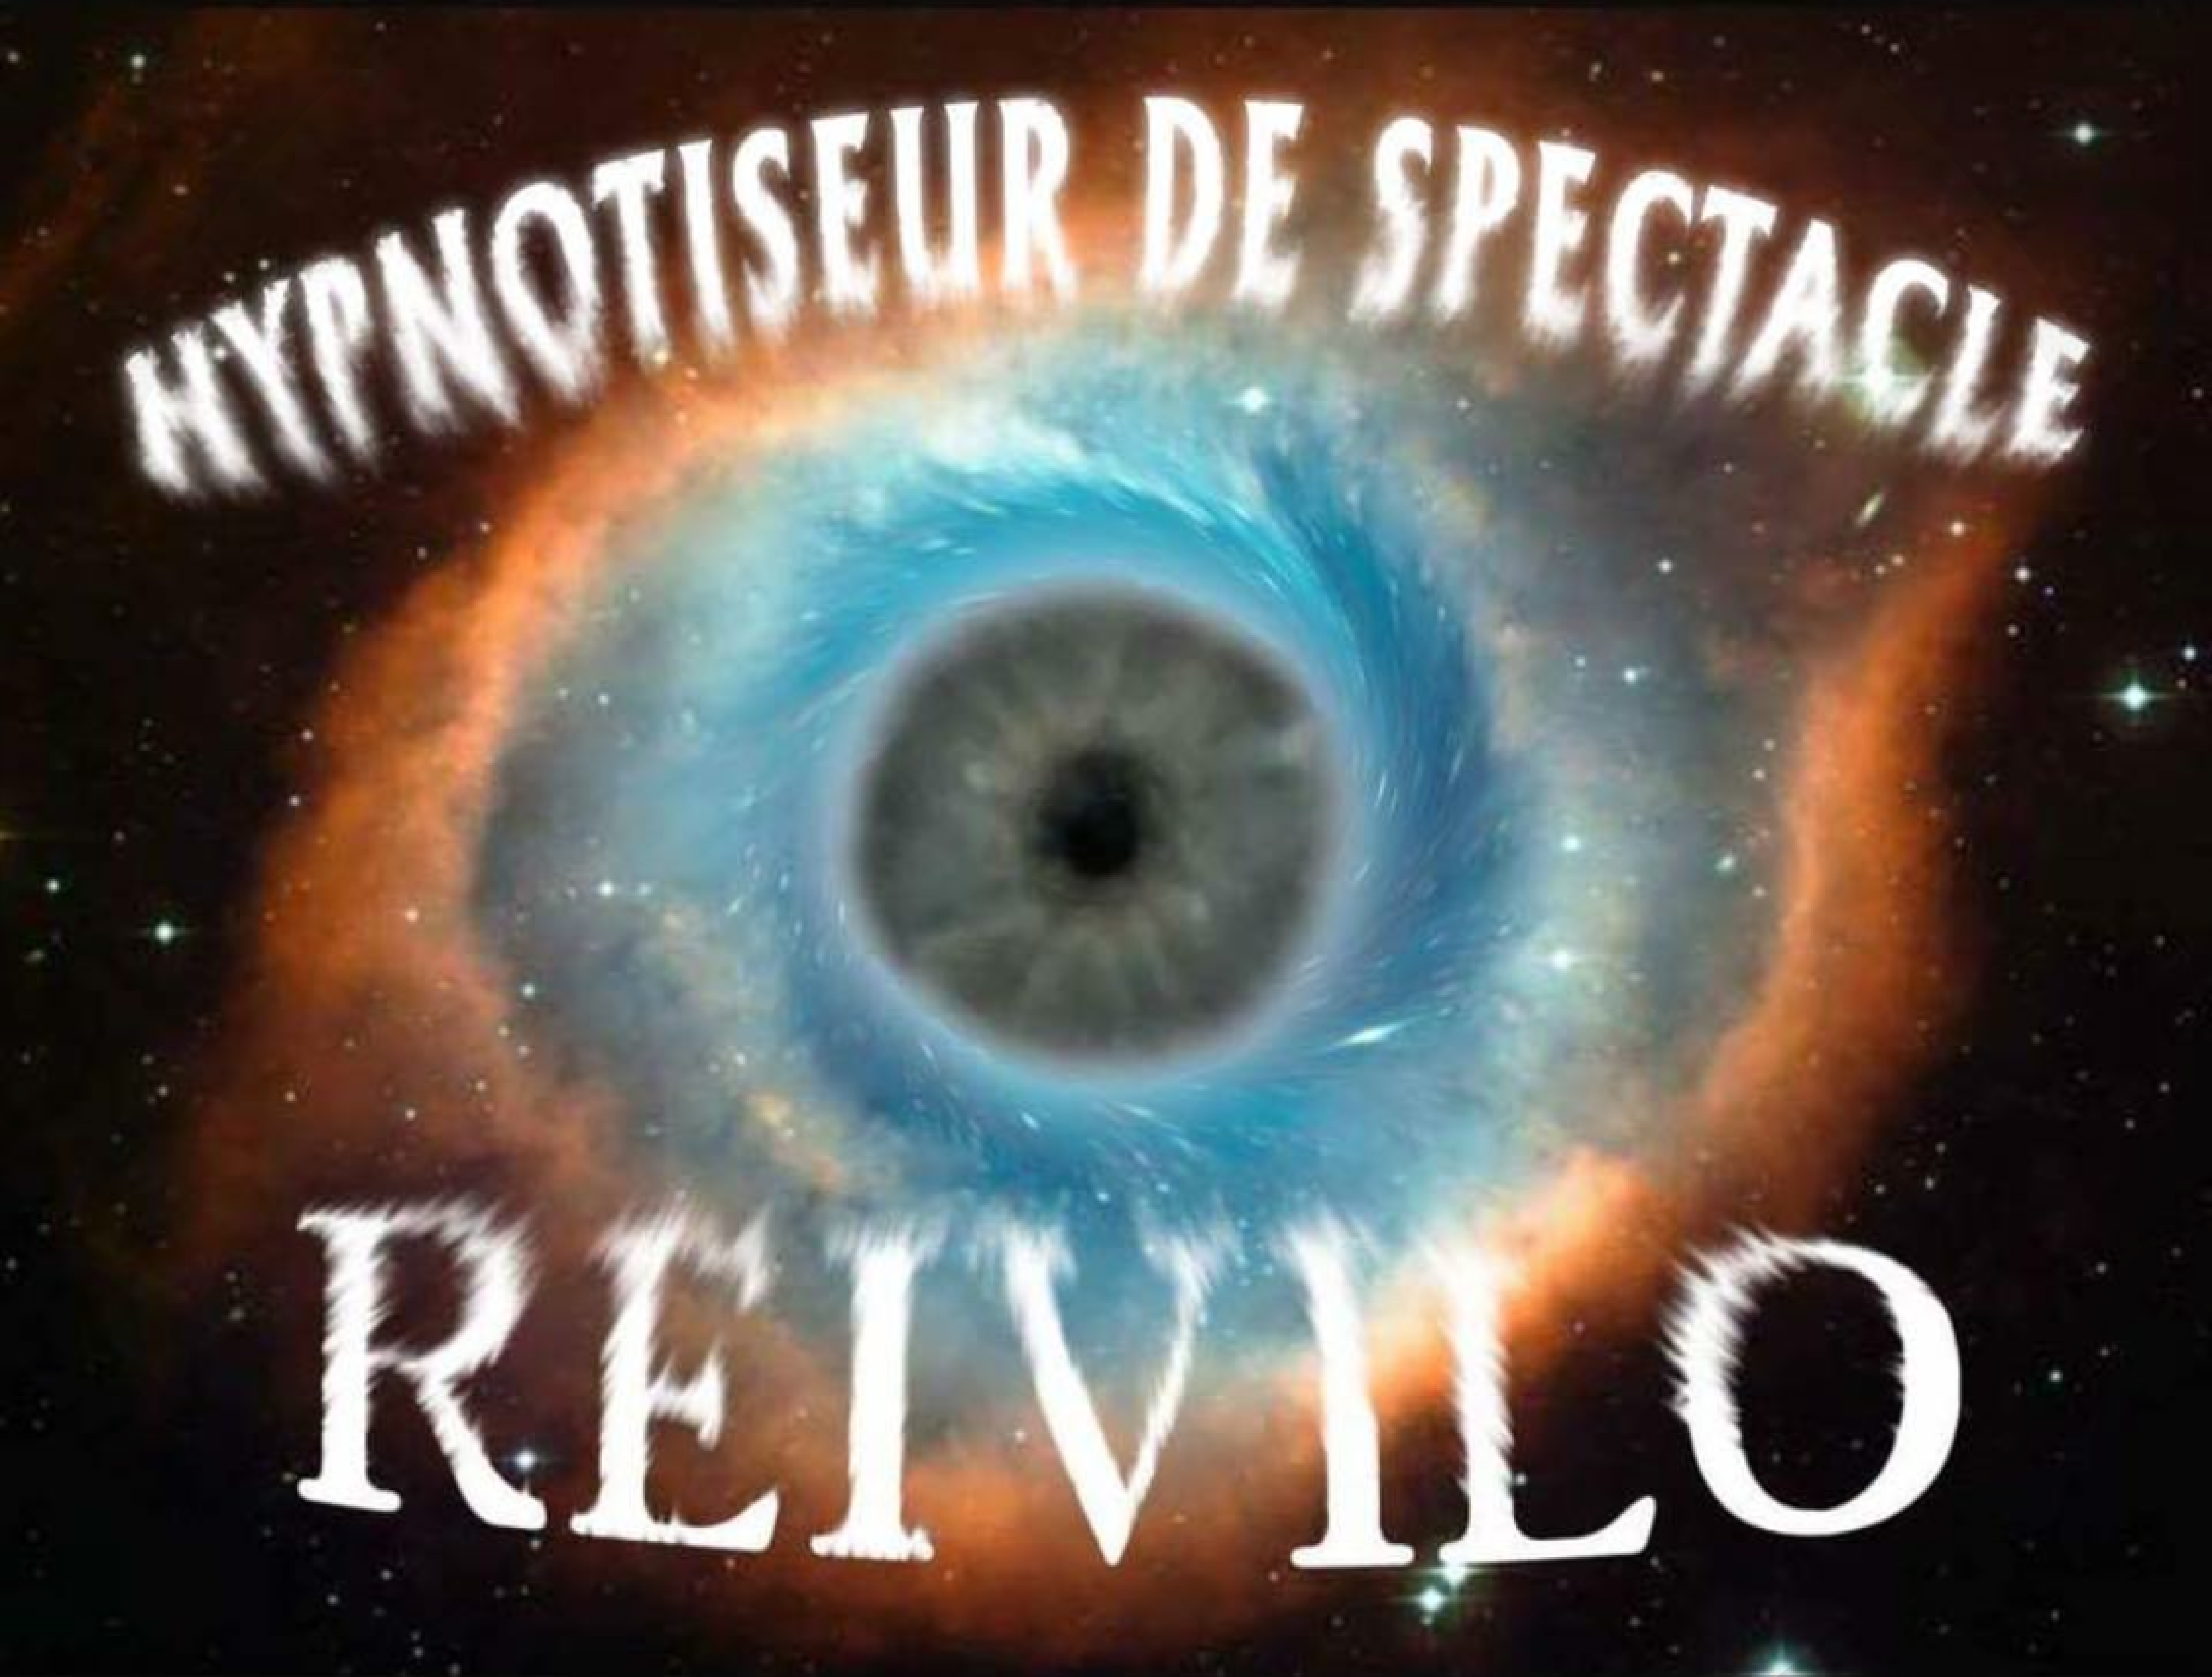 Reivilo hypnose